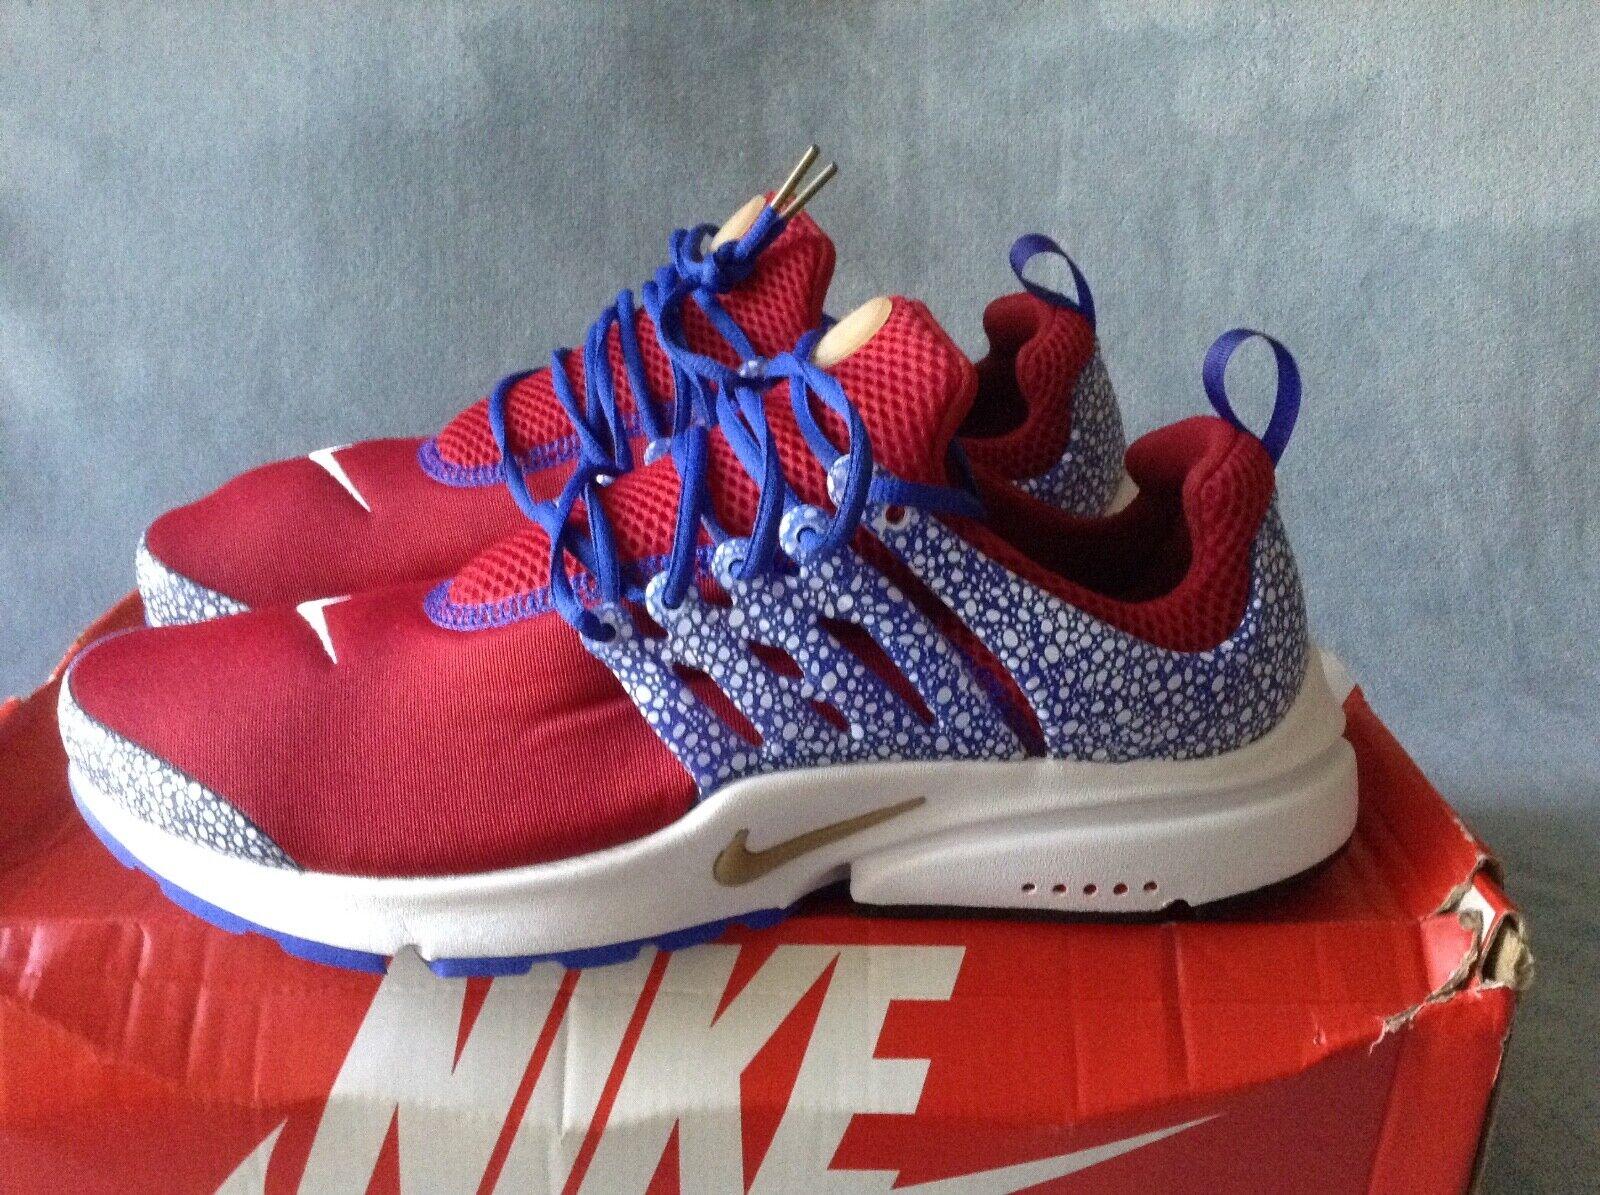 Nike Air Presto QS Safari Pack Gym Red 886043-600 Size 11